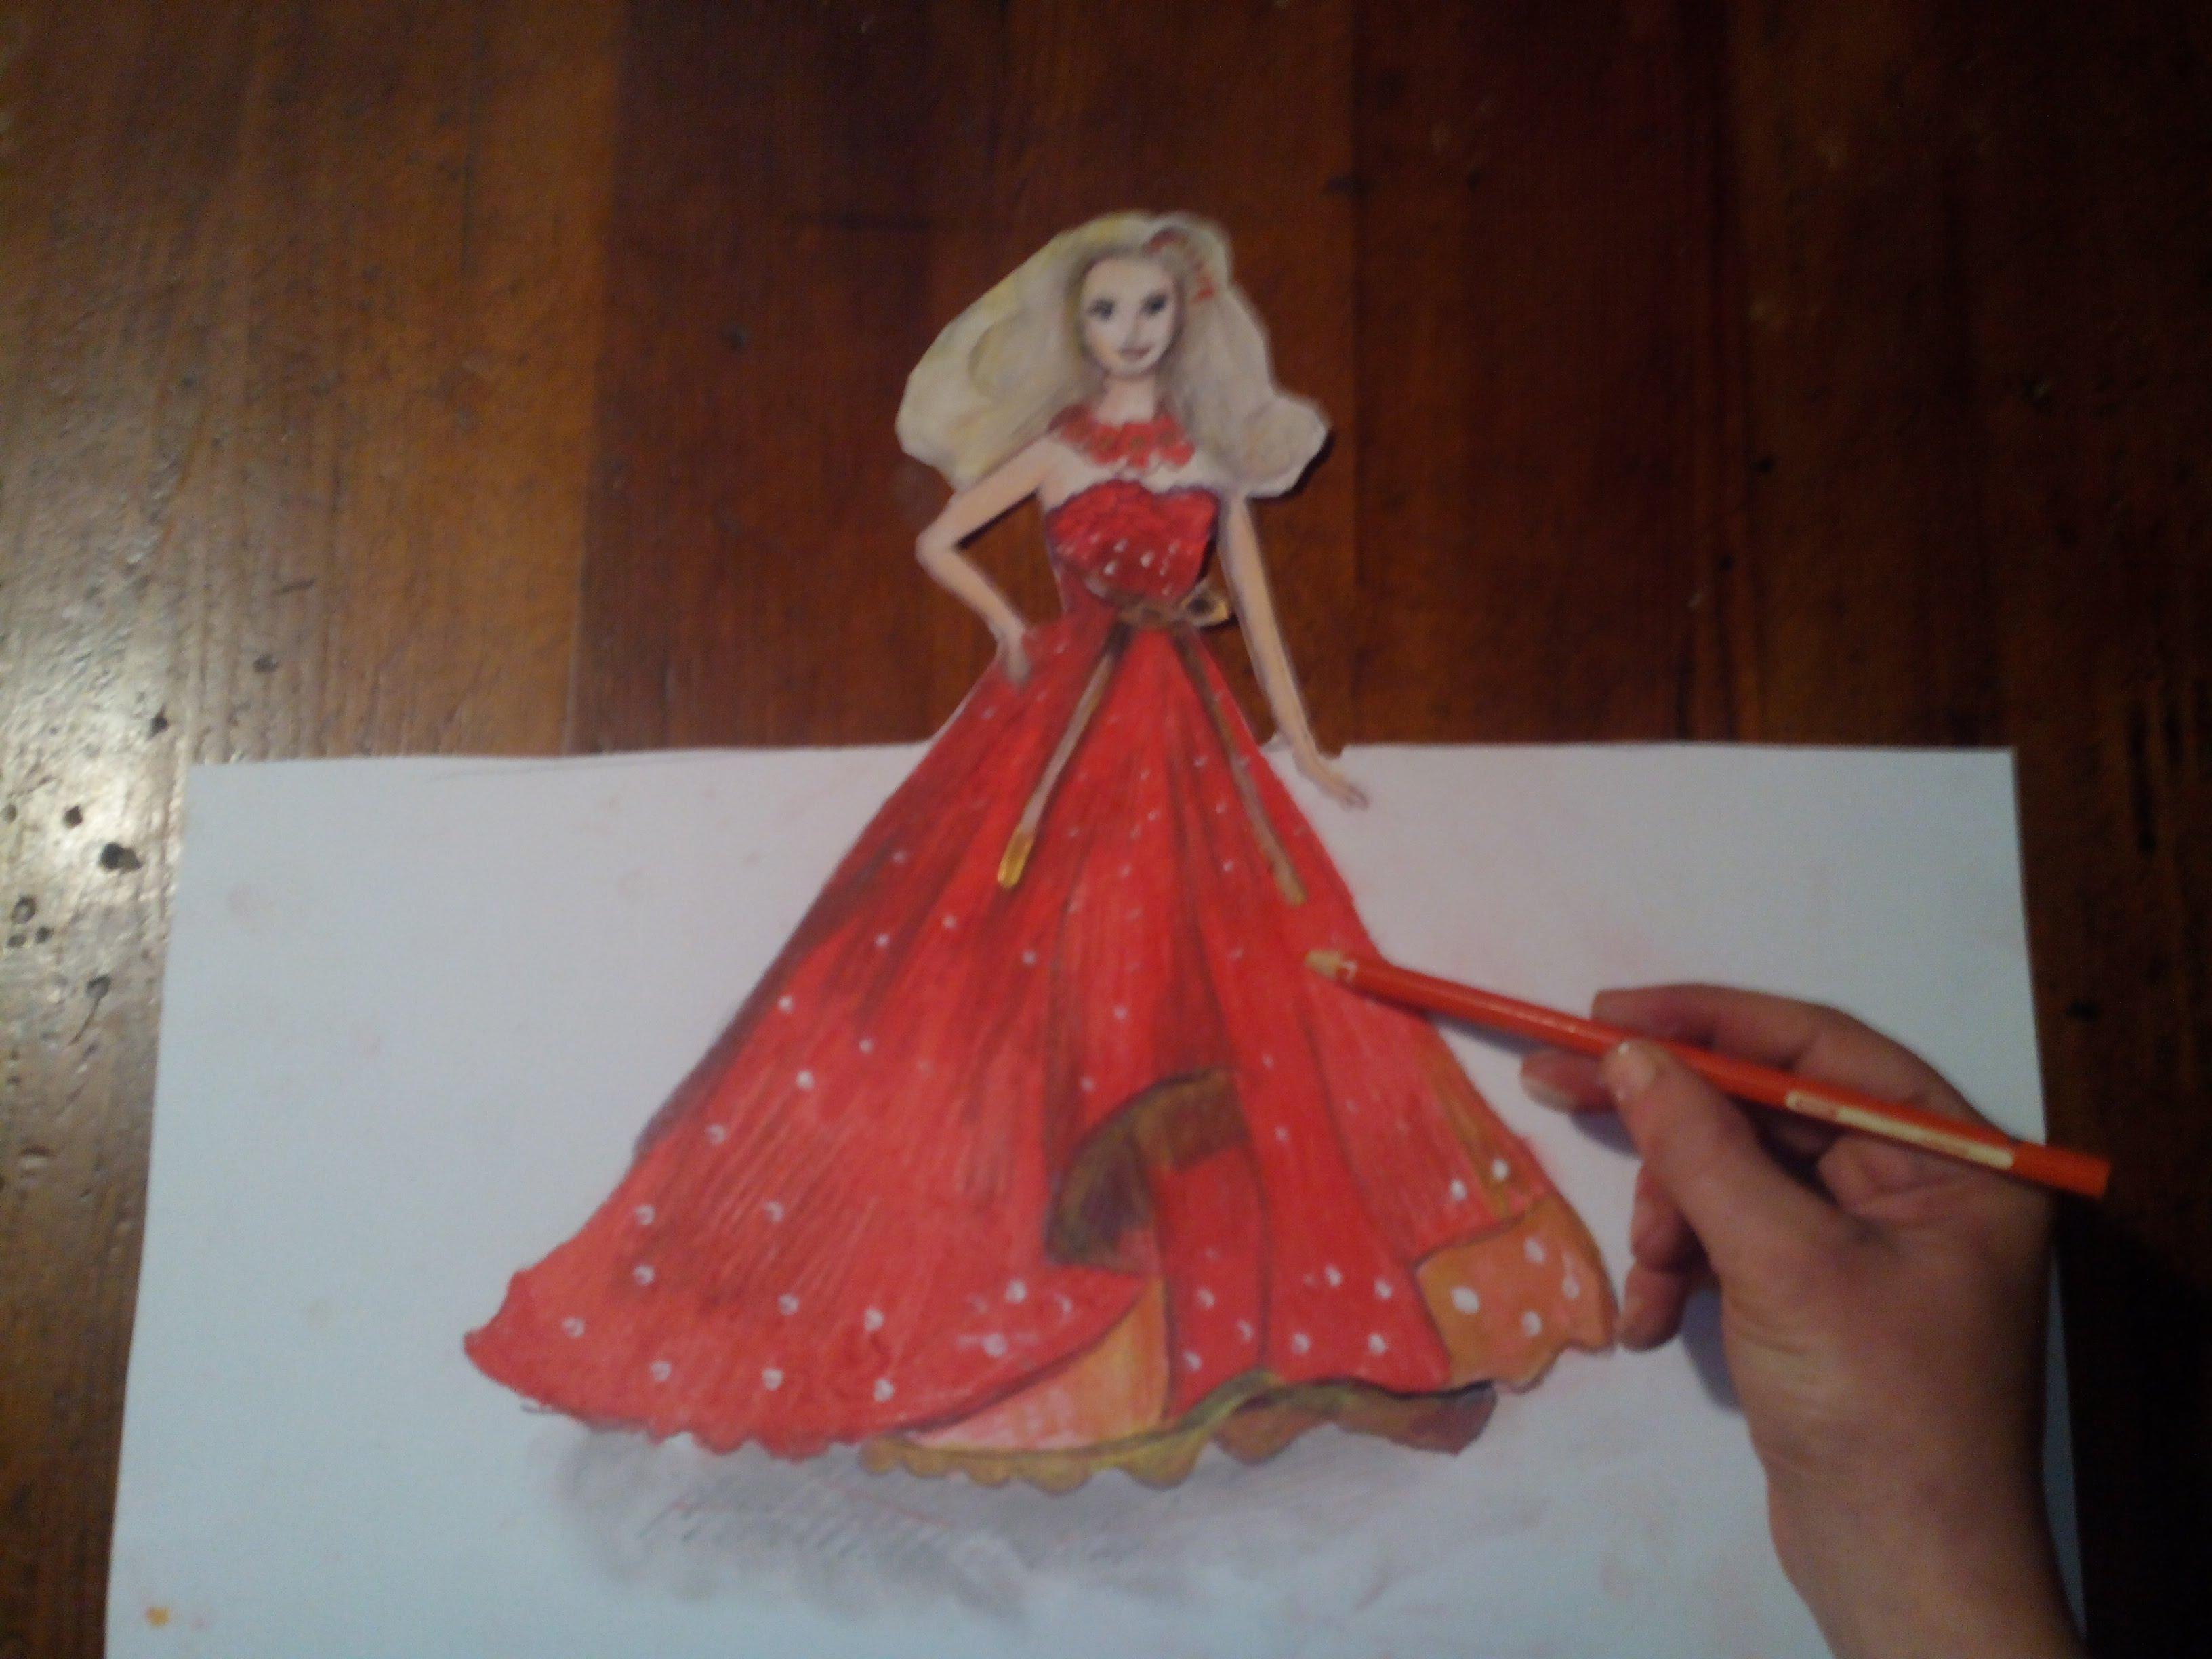 Drawn barbie frock Chúa draw princess barbie công